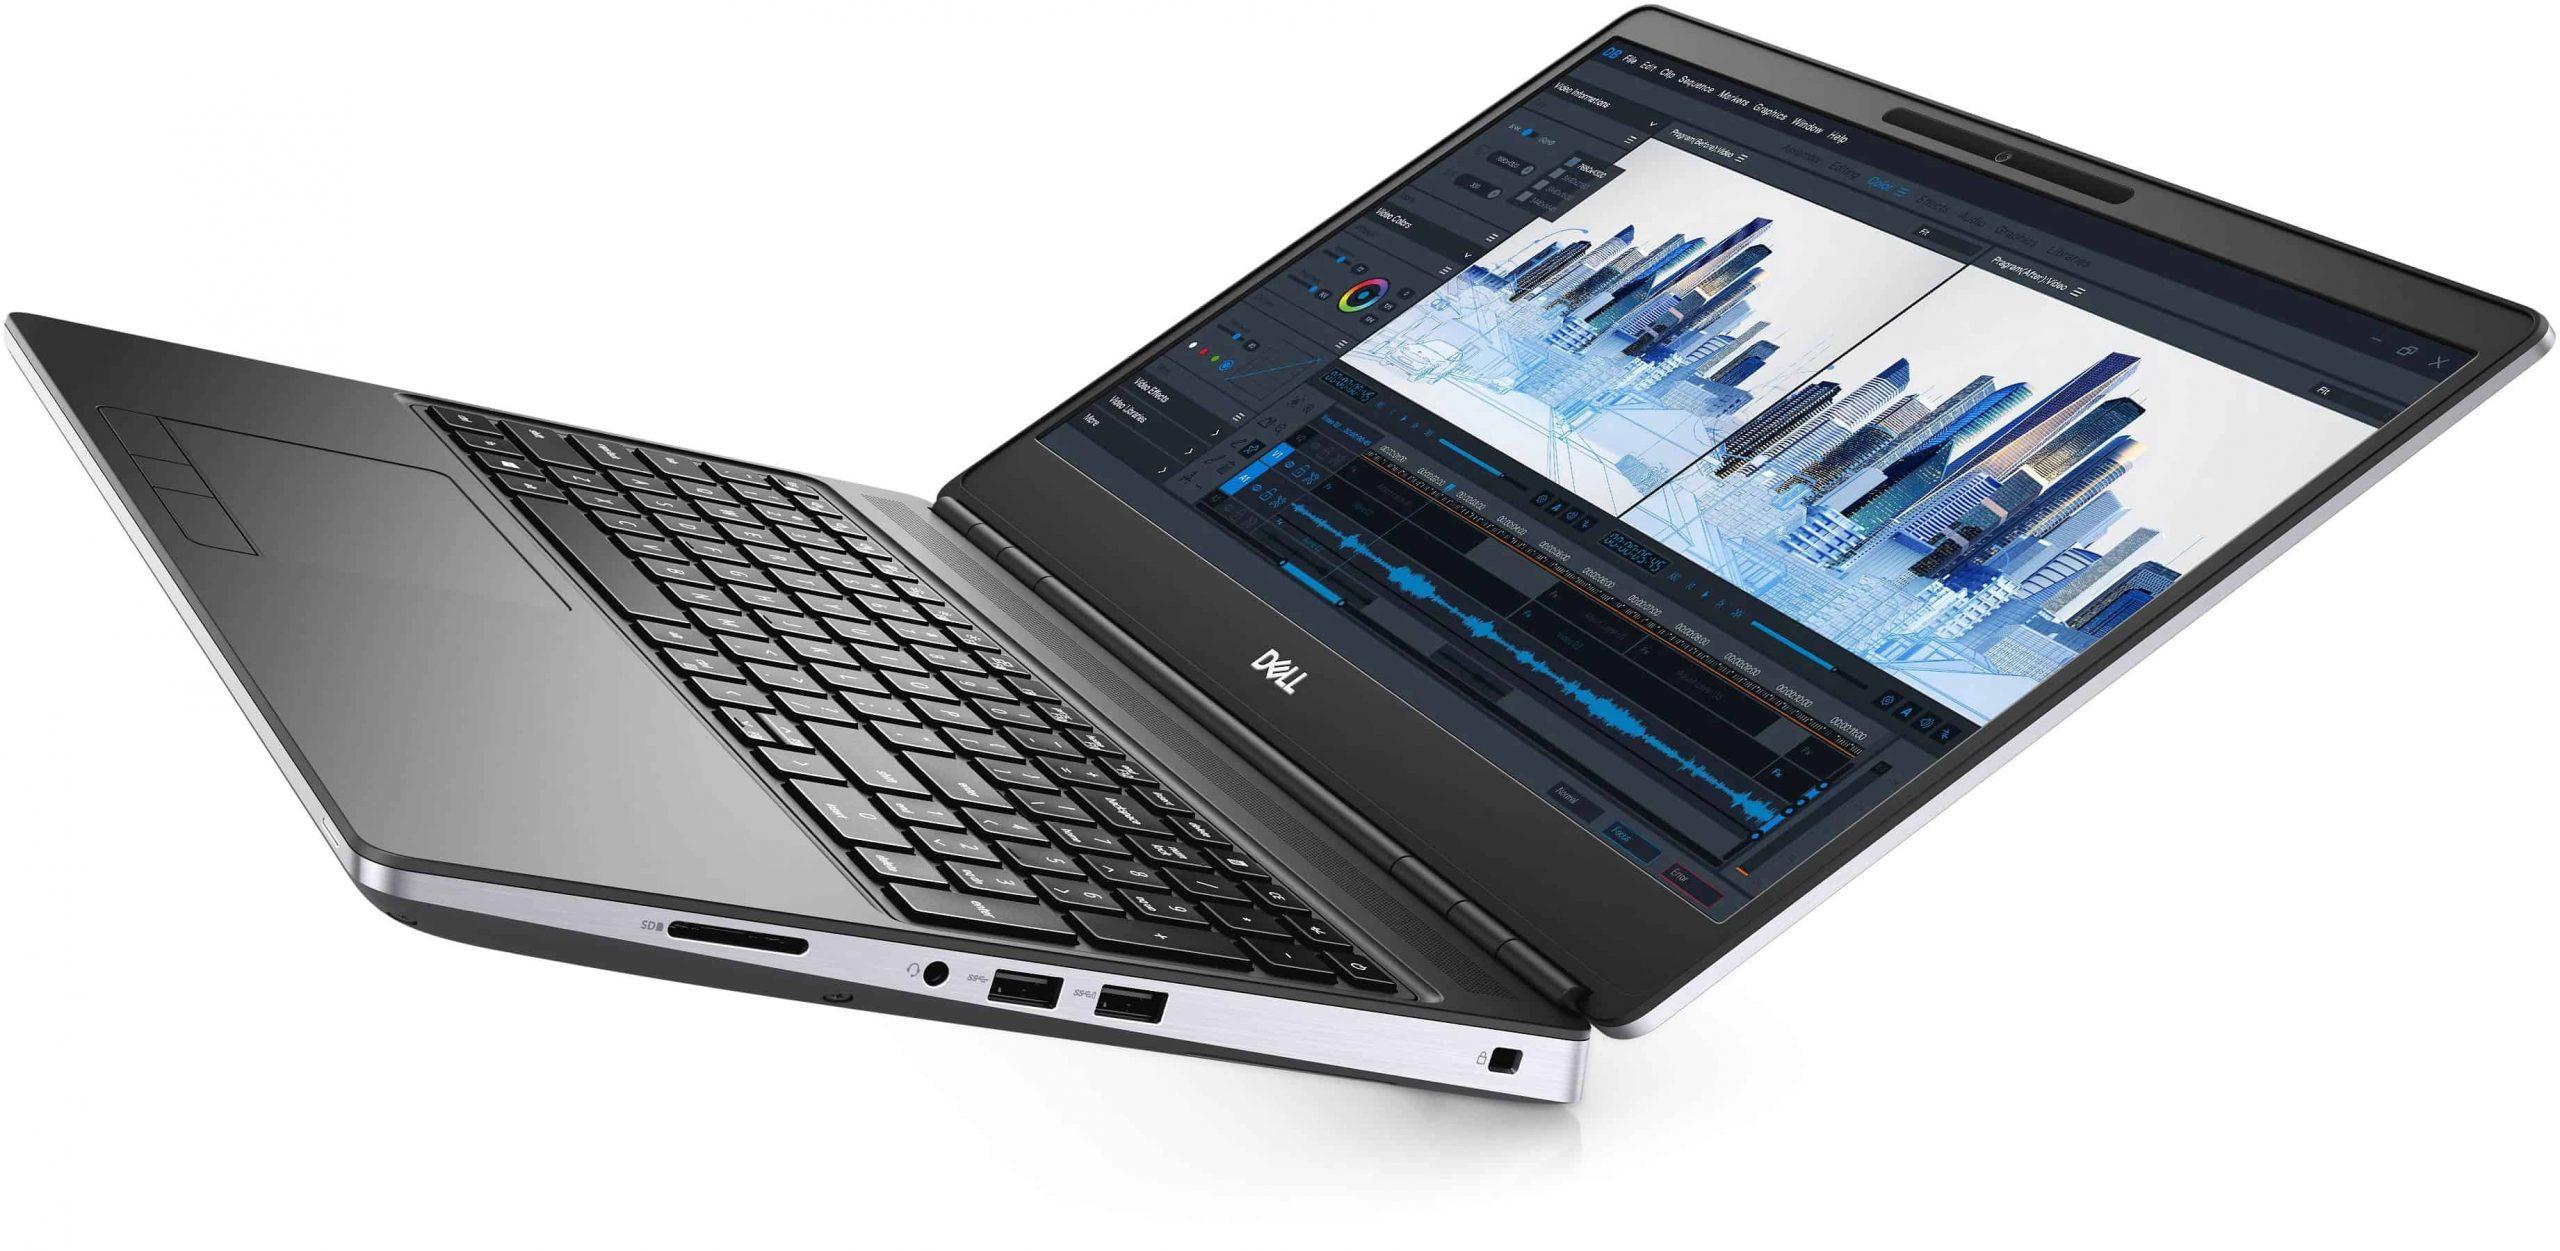 dell laptop workstation